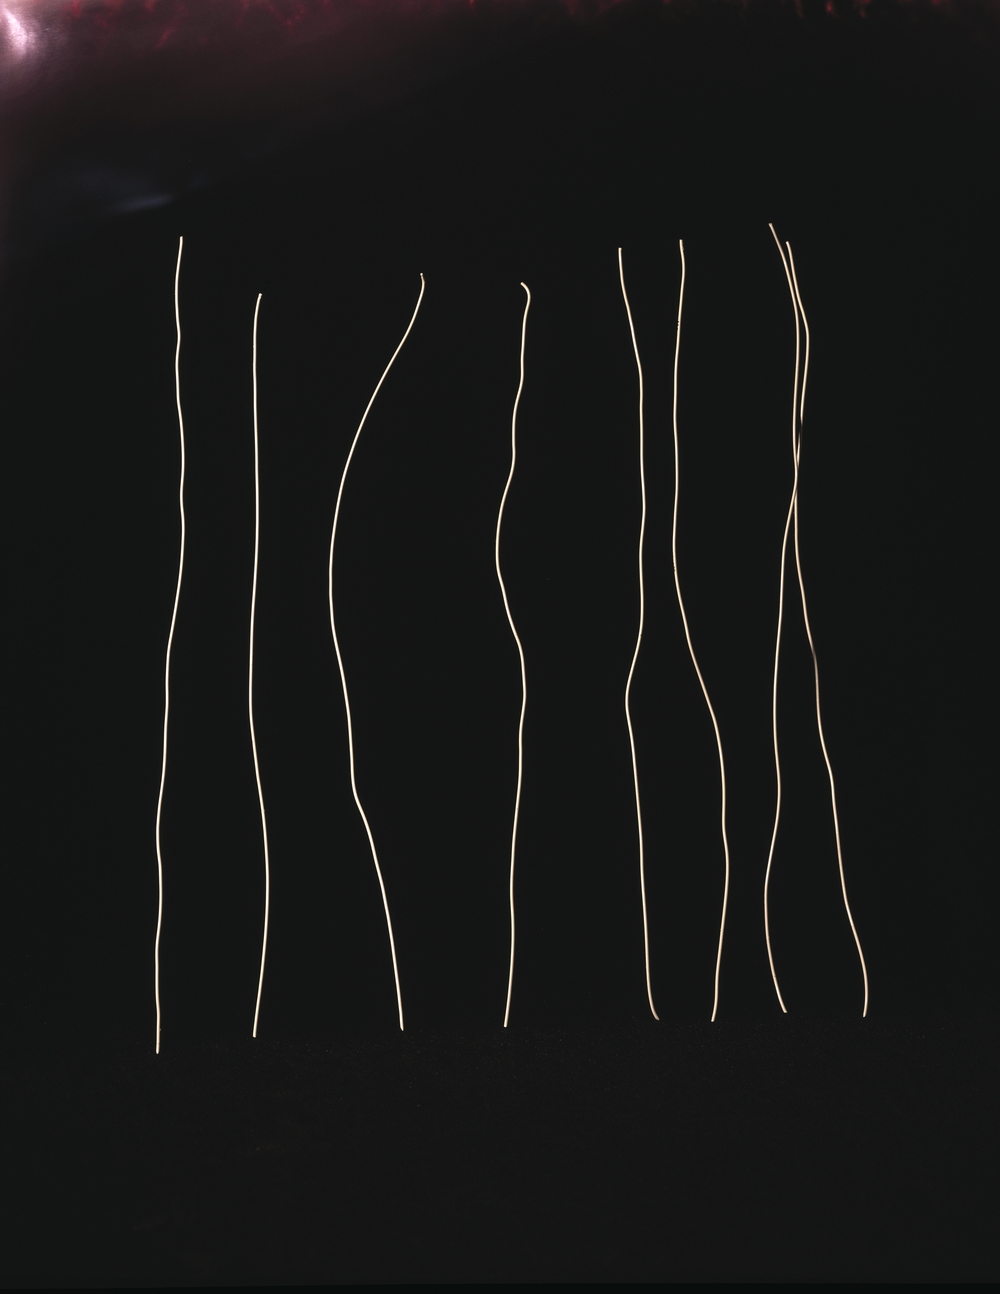 II (Lines), C-Print, 17 x 22 inches, 2011